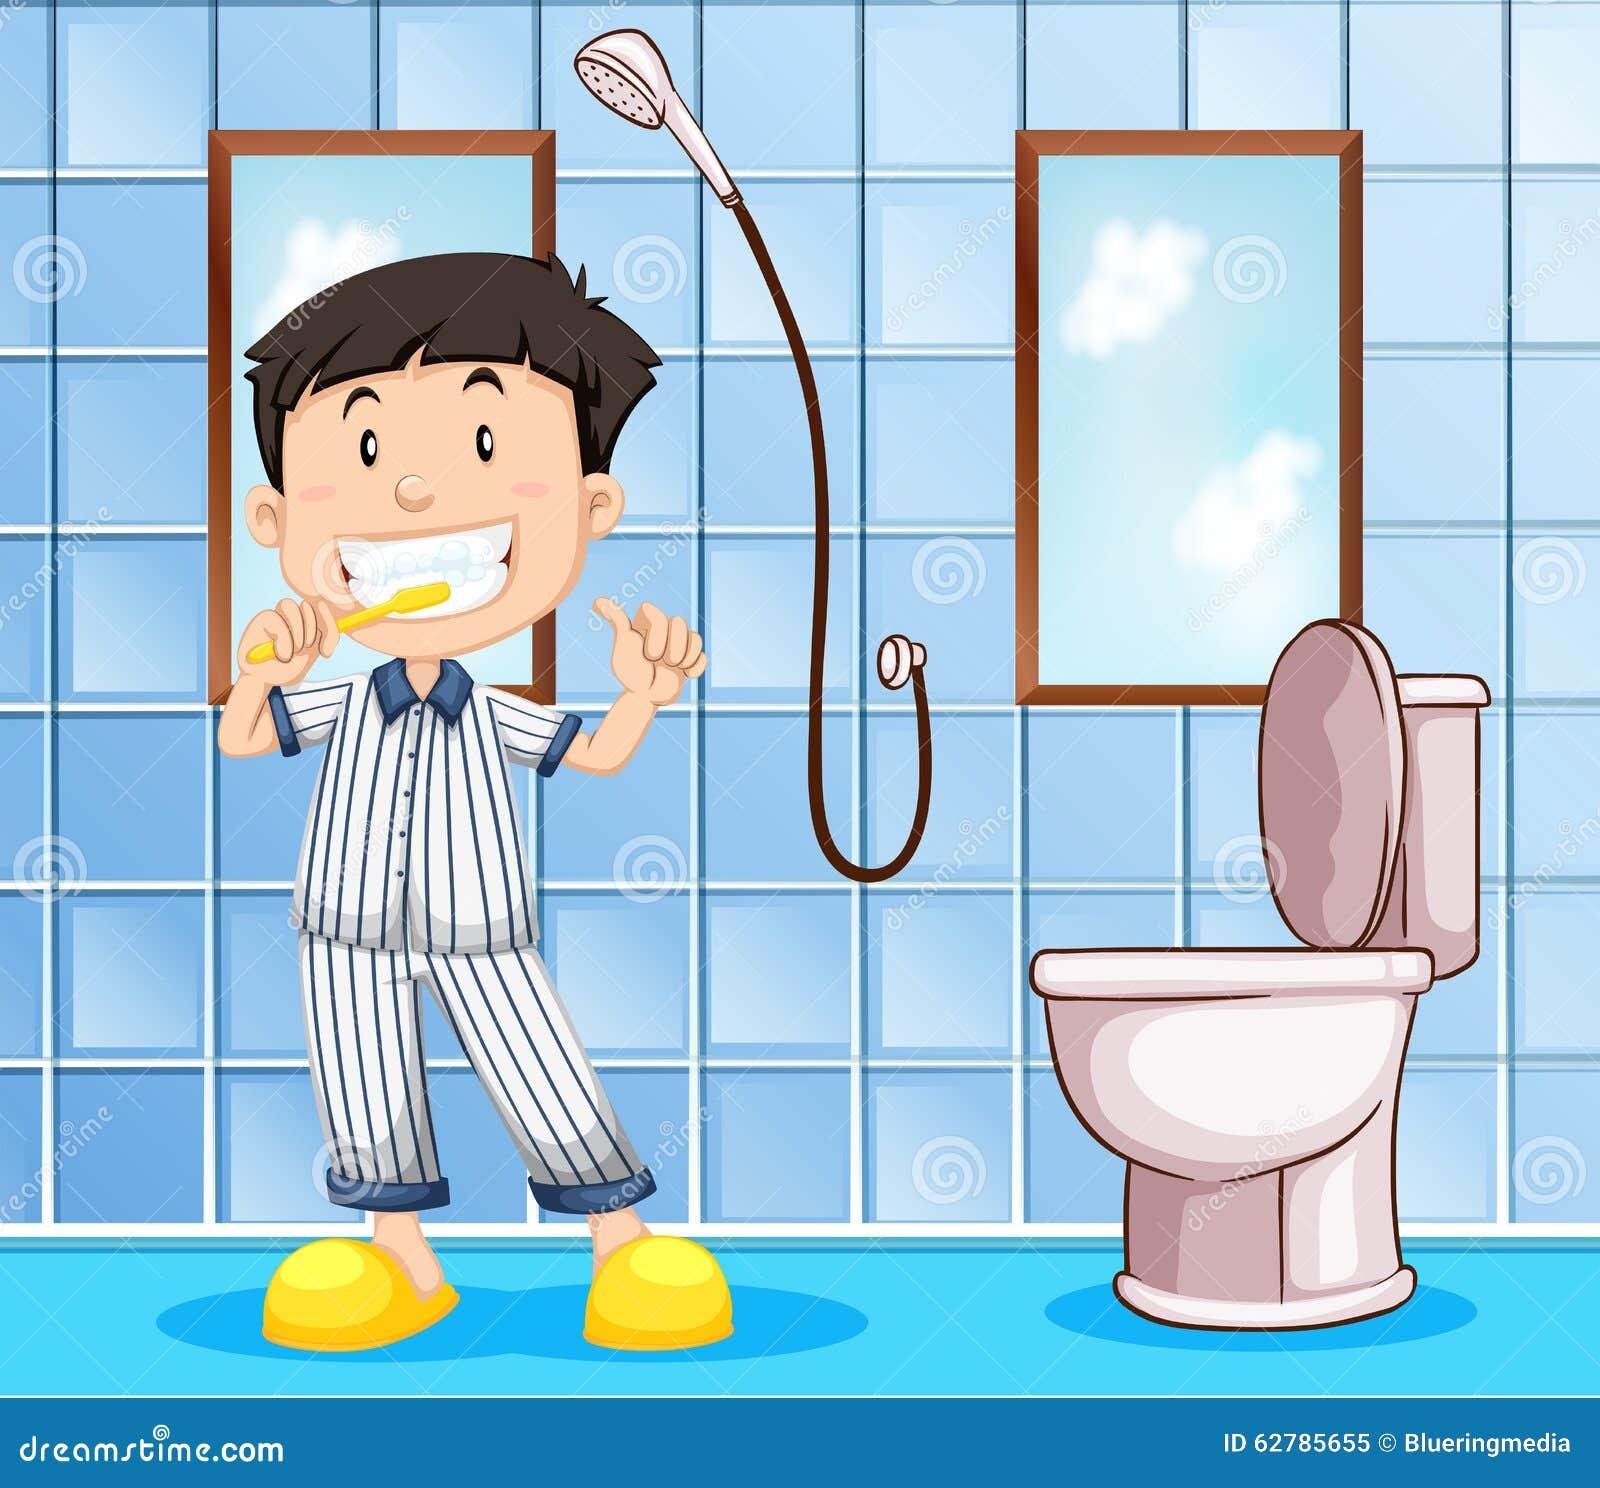 Go Bed And Bath: Boy Brushing Teeth In The Bathroom Stock Vector